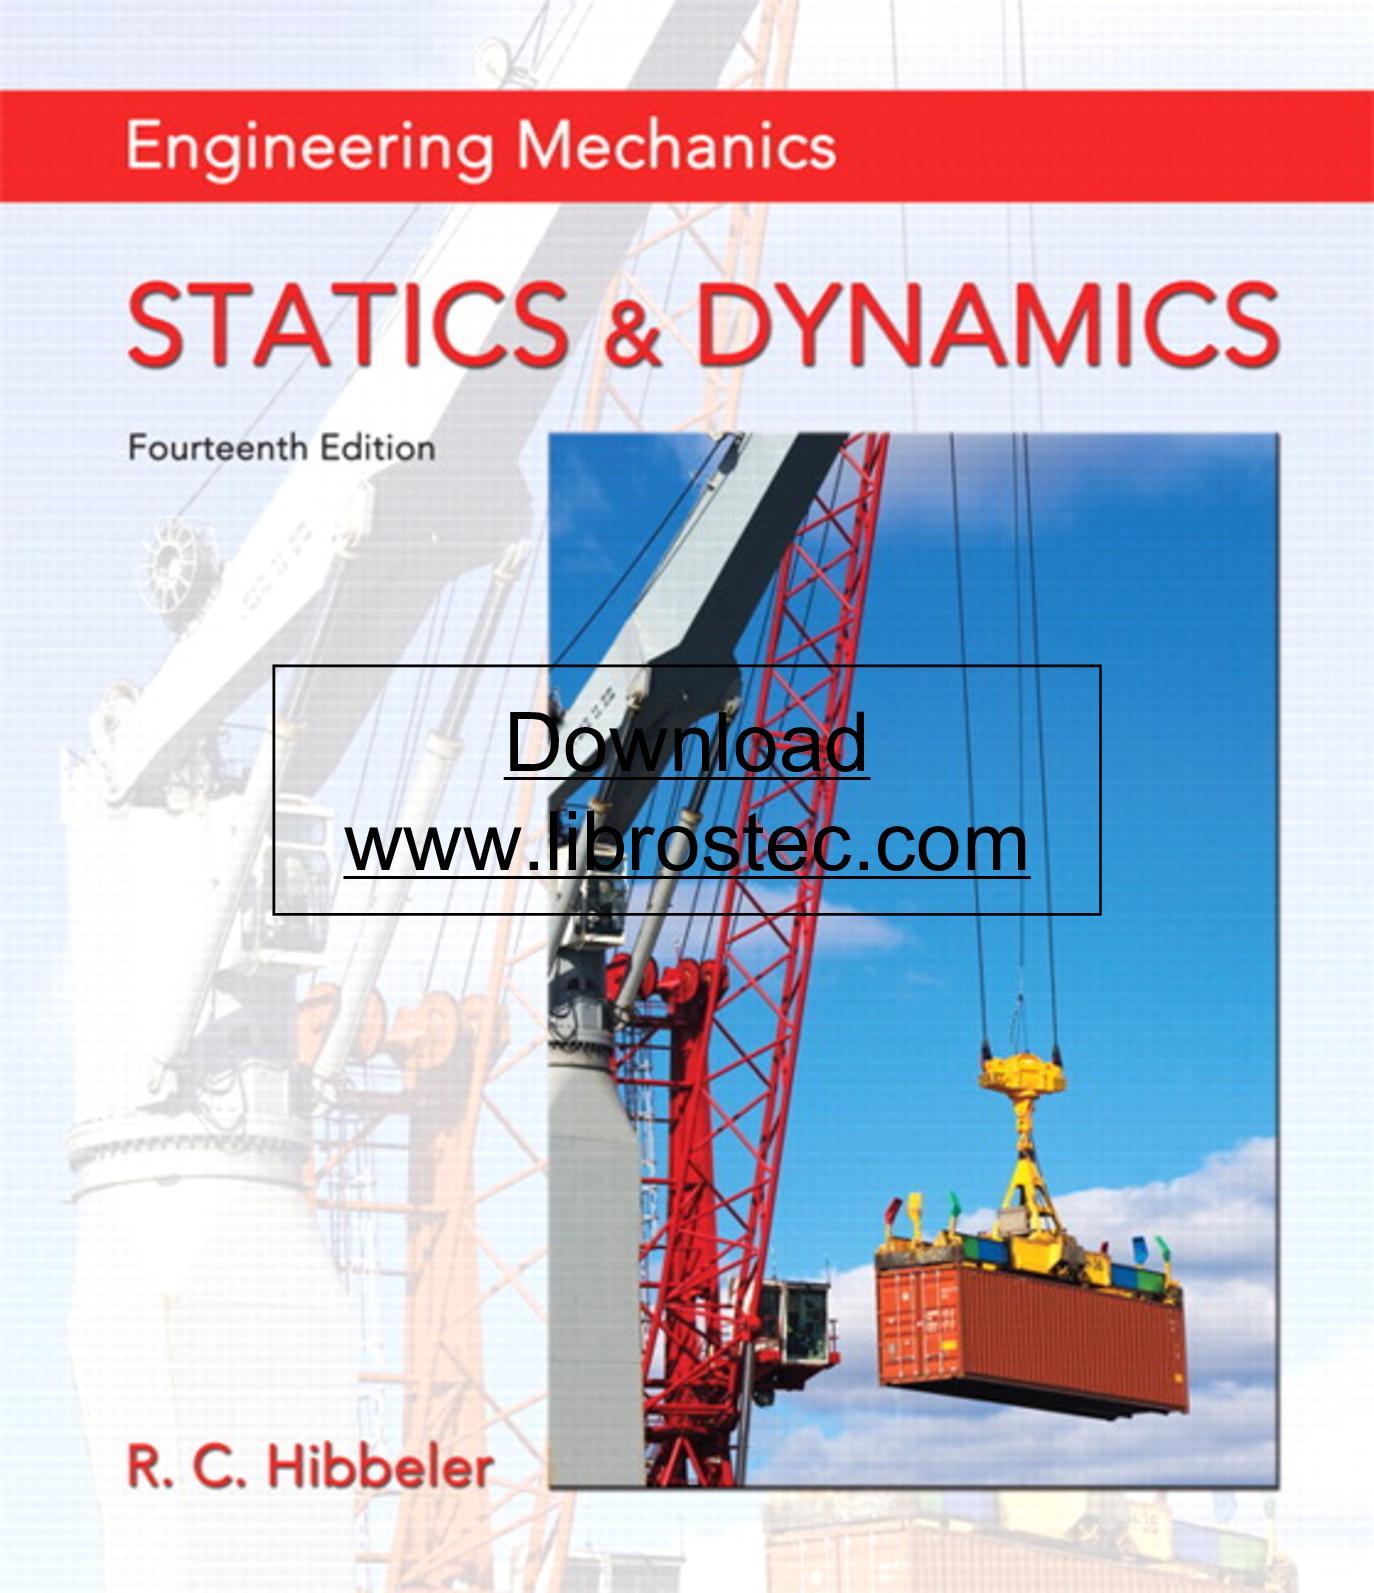 Calameo Hibbeler Engineering Mechanics Statics And Dynamics 14th Ed 2016 Pdf Download